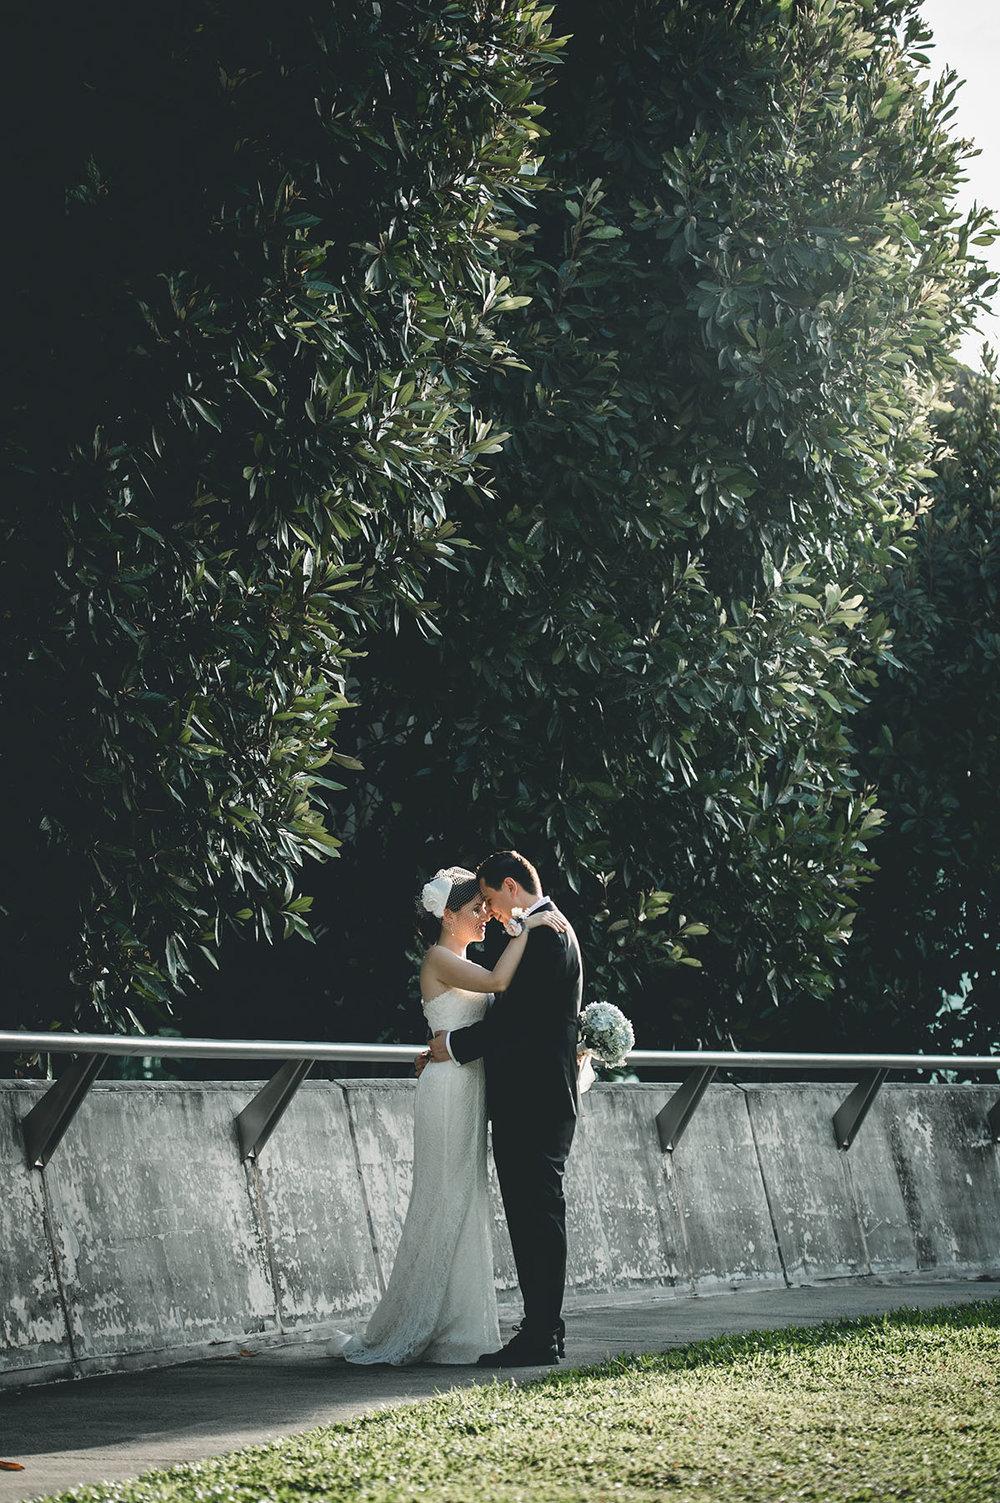 01 Prewedding Marina Barrage 00001b.JPG